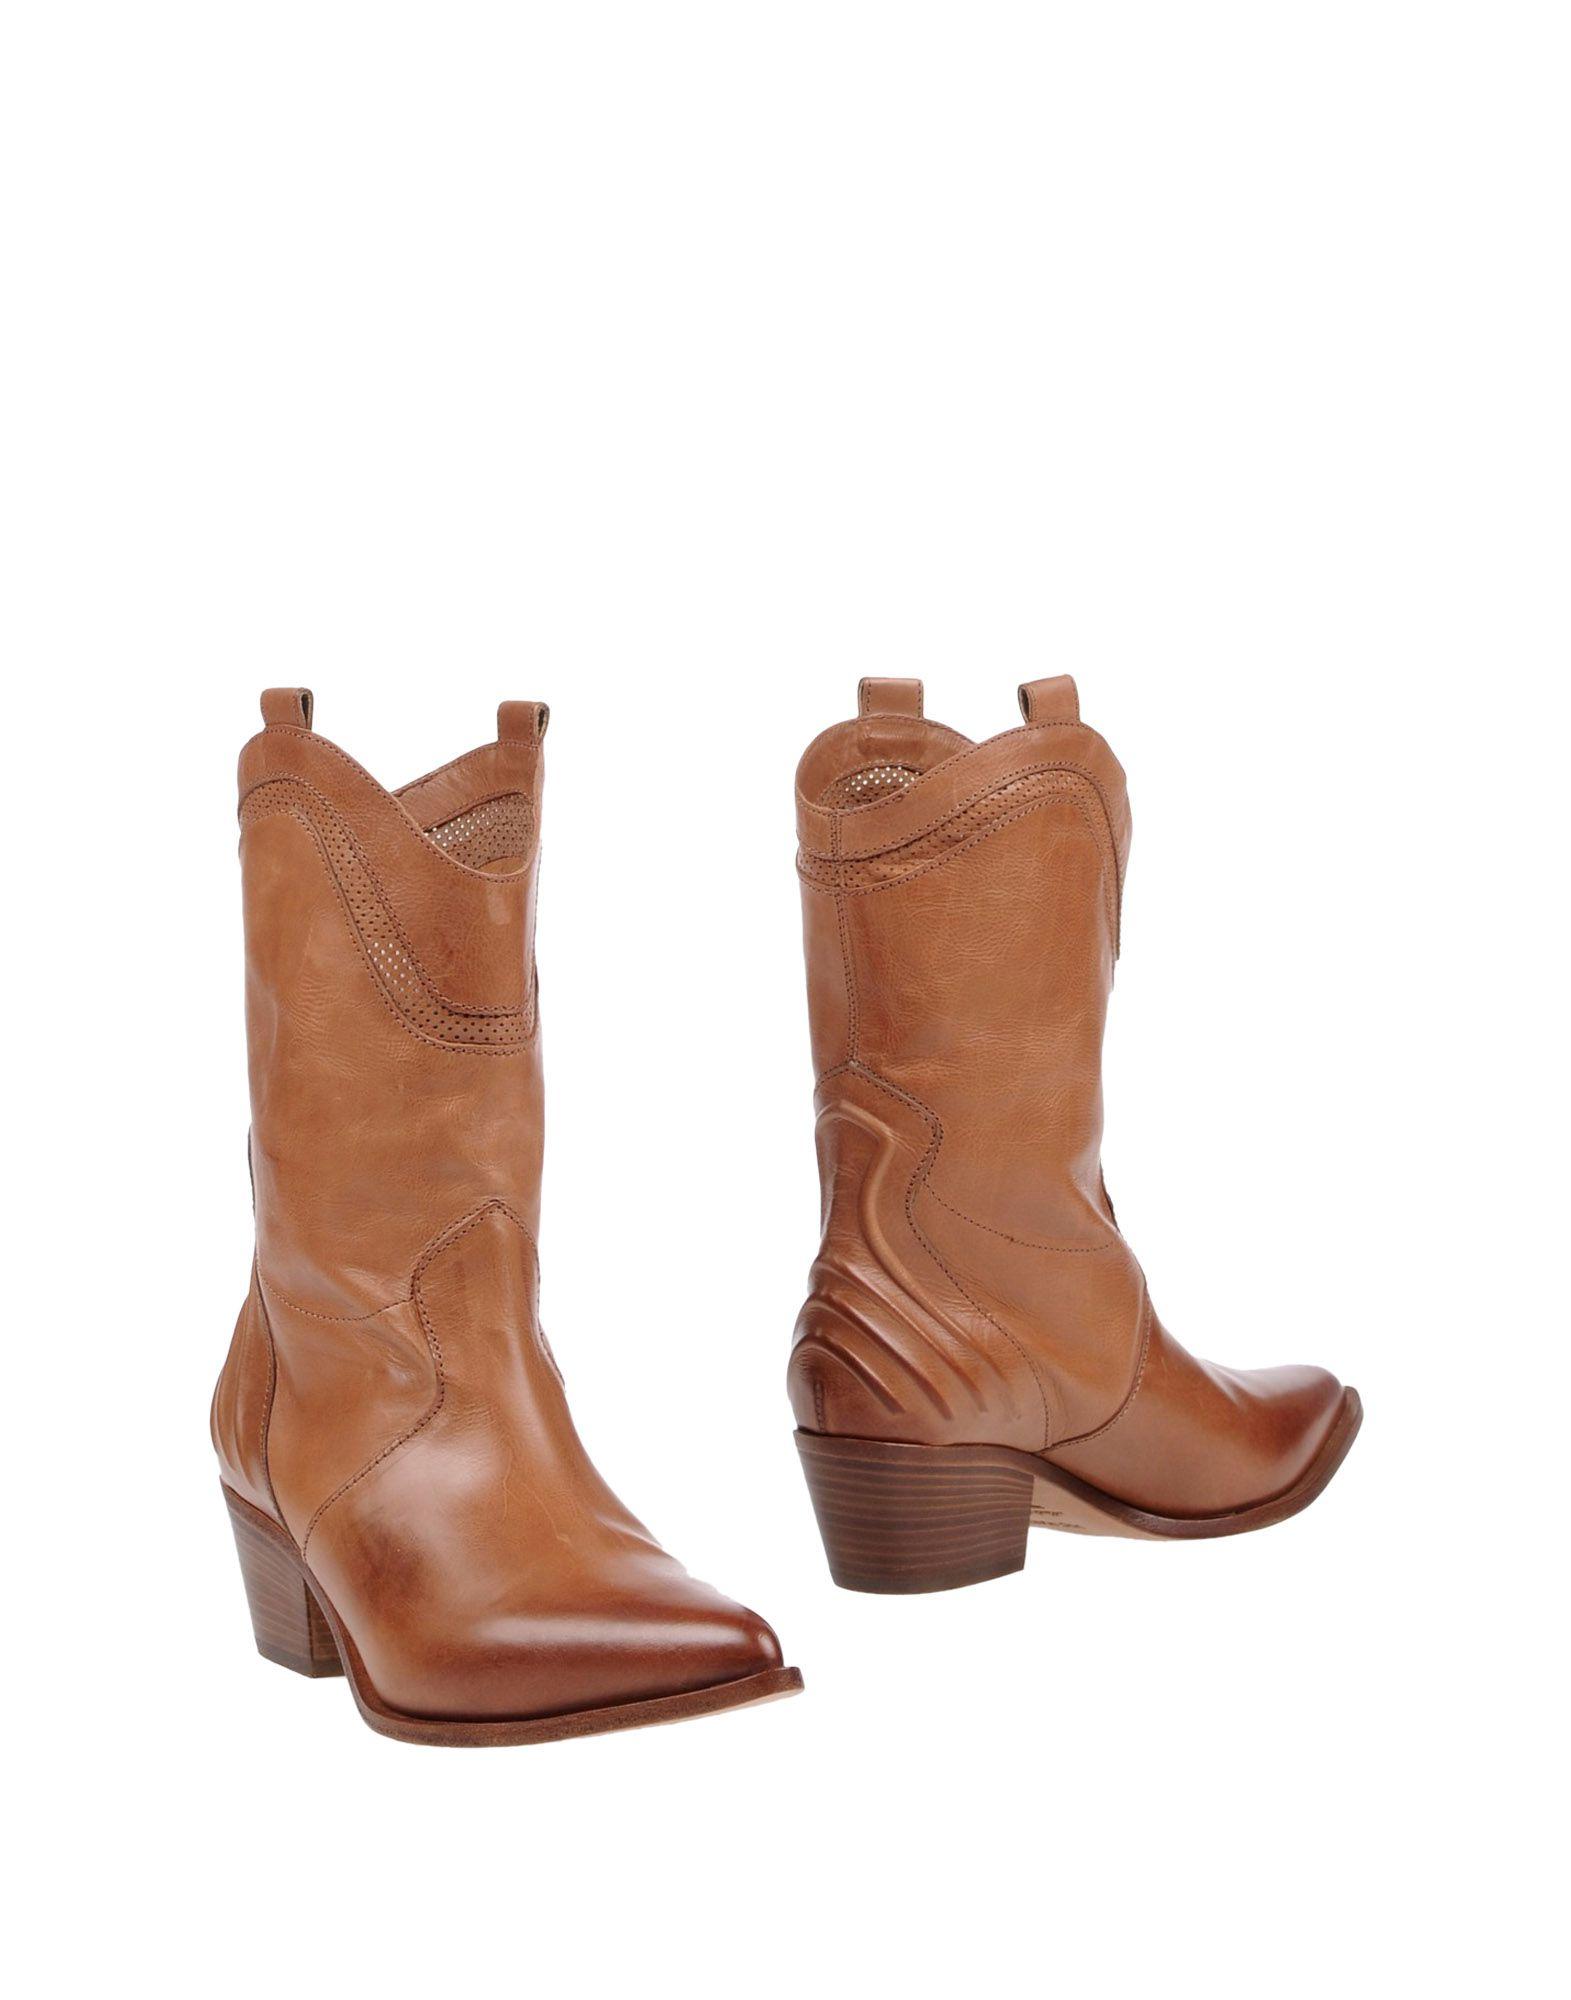 Vic Matiē Stiefelette strapazierfähige Damen  11454593KAGut aussehende strapazierfähige Stiefelette Schuhe 317b1d